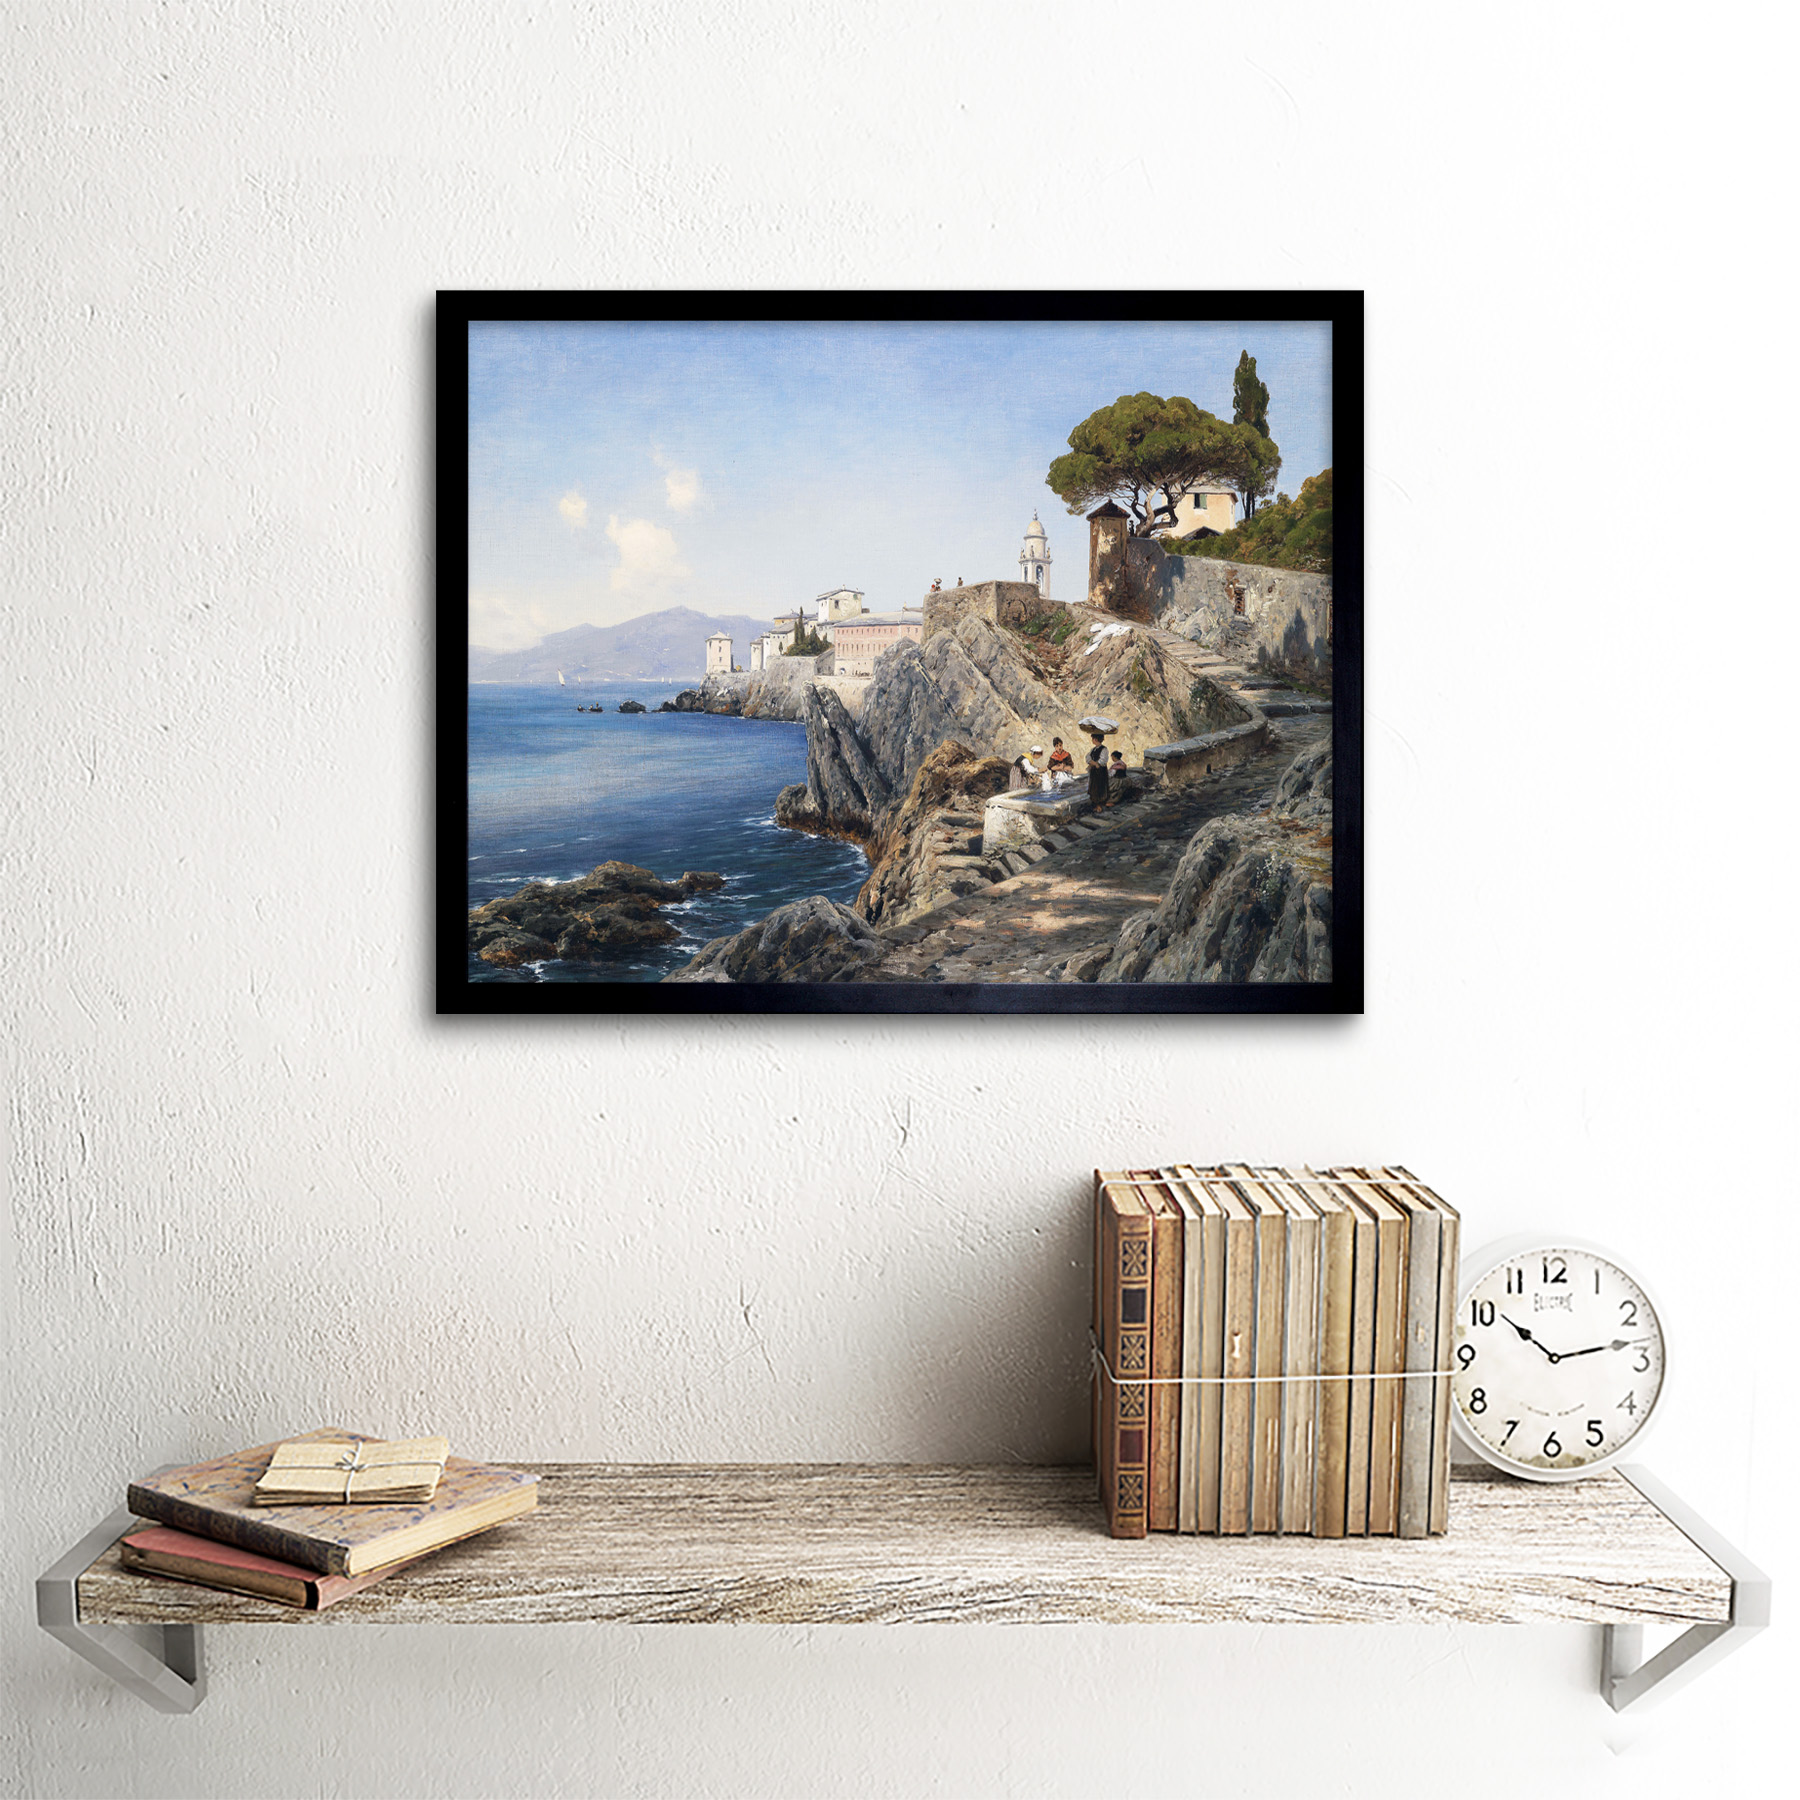 Lutteroth-Sturla-Shore-Genoa-Italy-Seascape-Painting-Art-Print-Framed-12x16 thumbnail 3